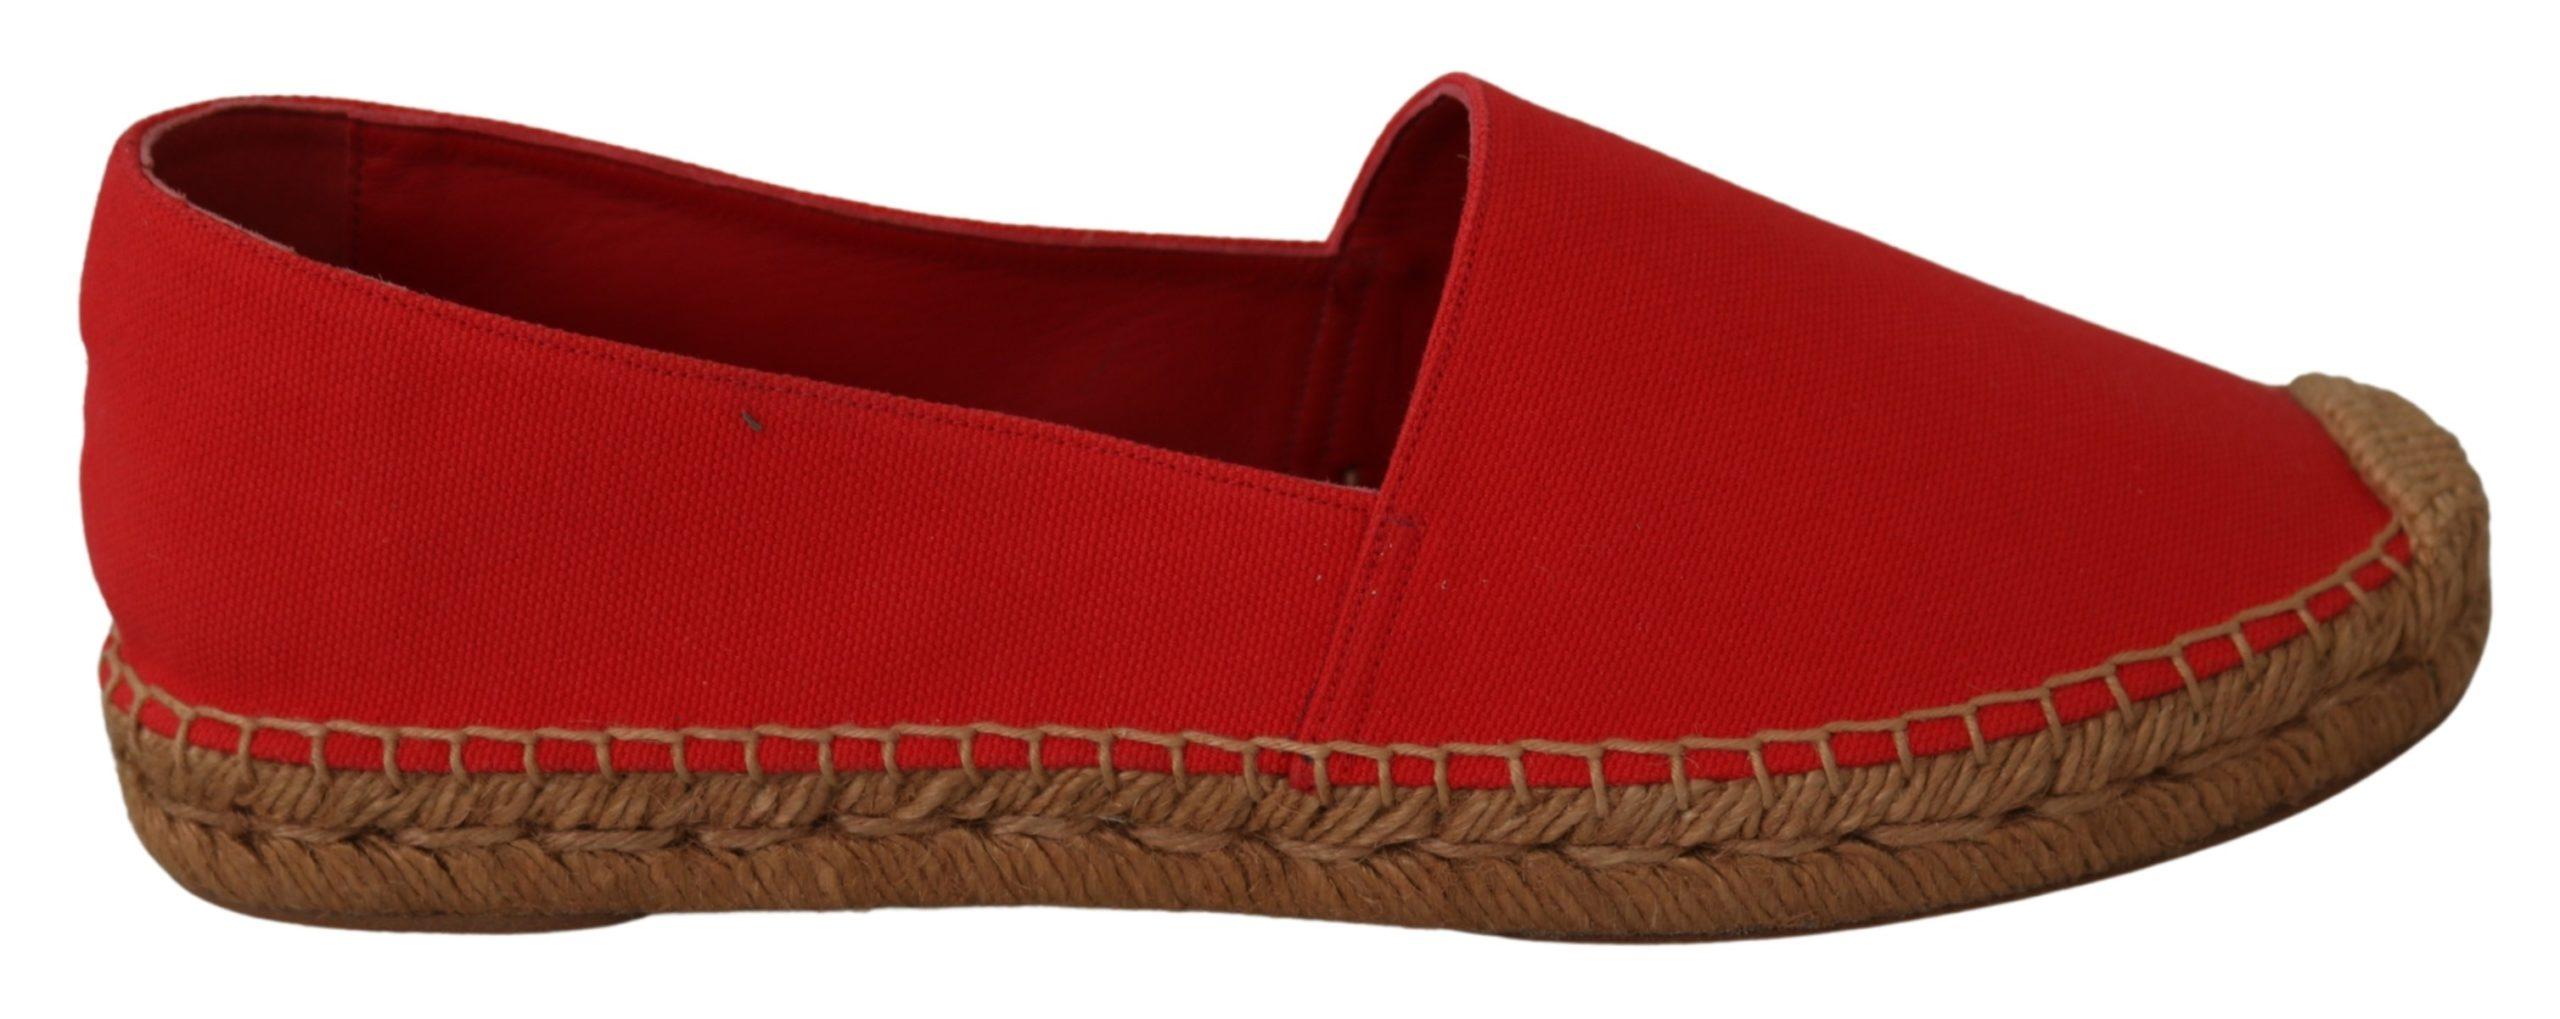 Red Flats Espadrilles Loafers Linen Shoes - EU39/US8.5